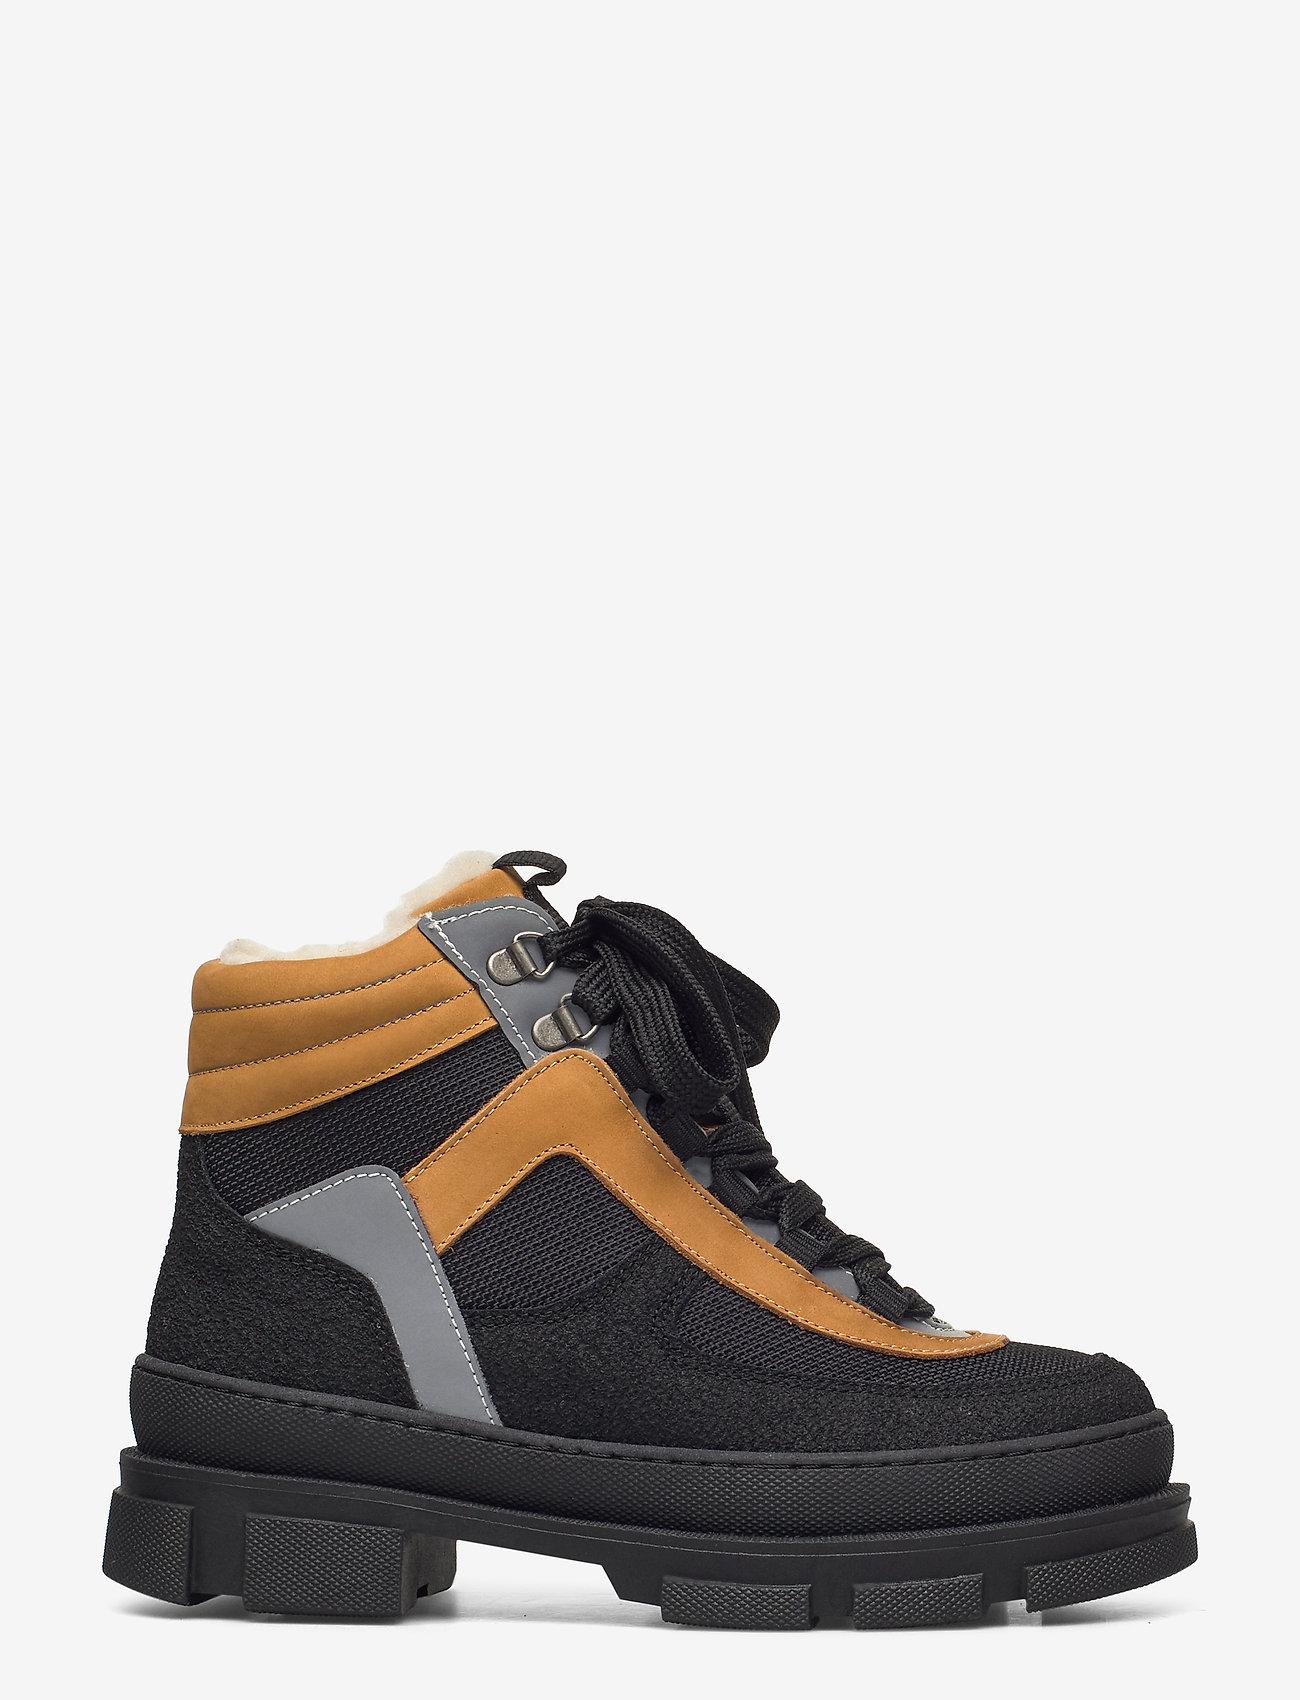 ANGULUS - Boots - flat - flade ankelstøvler - 1321/1631/1262/2012 sort/sort/ - 1